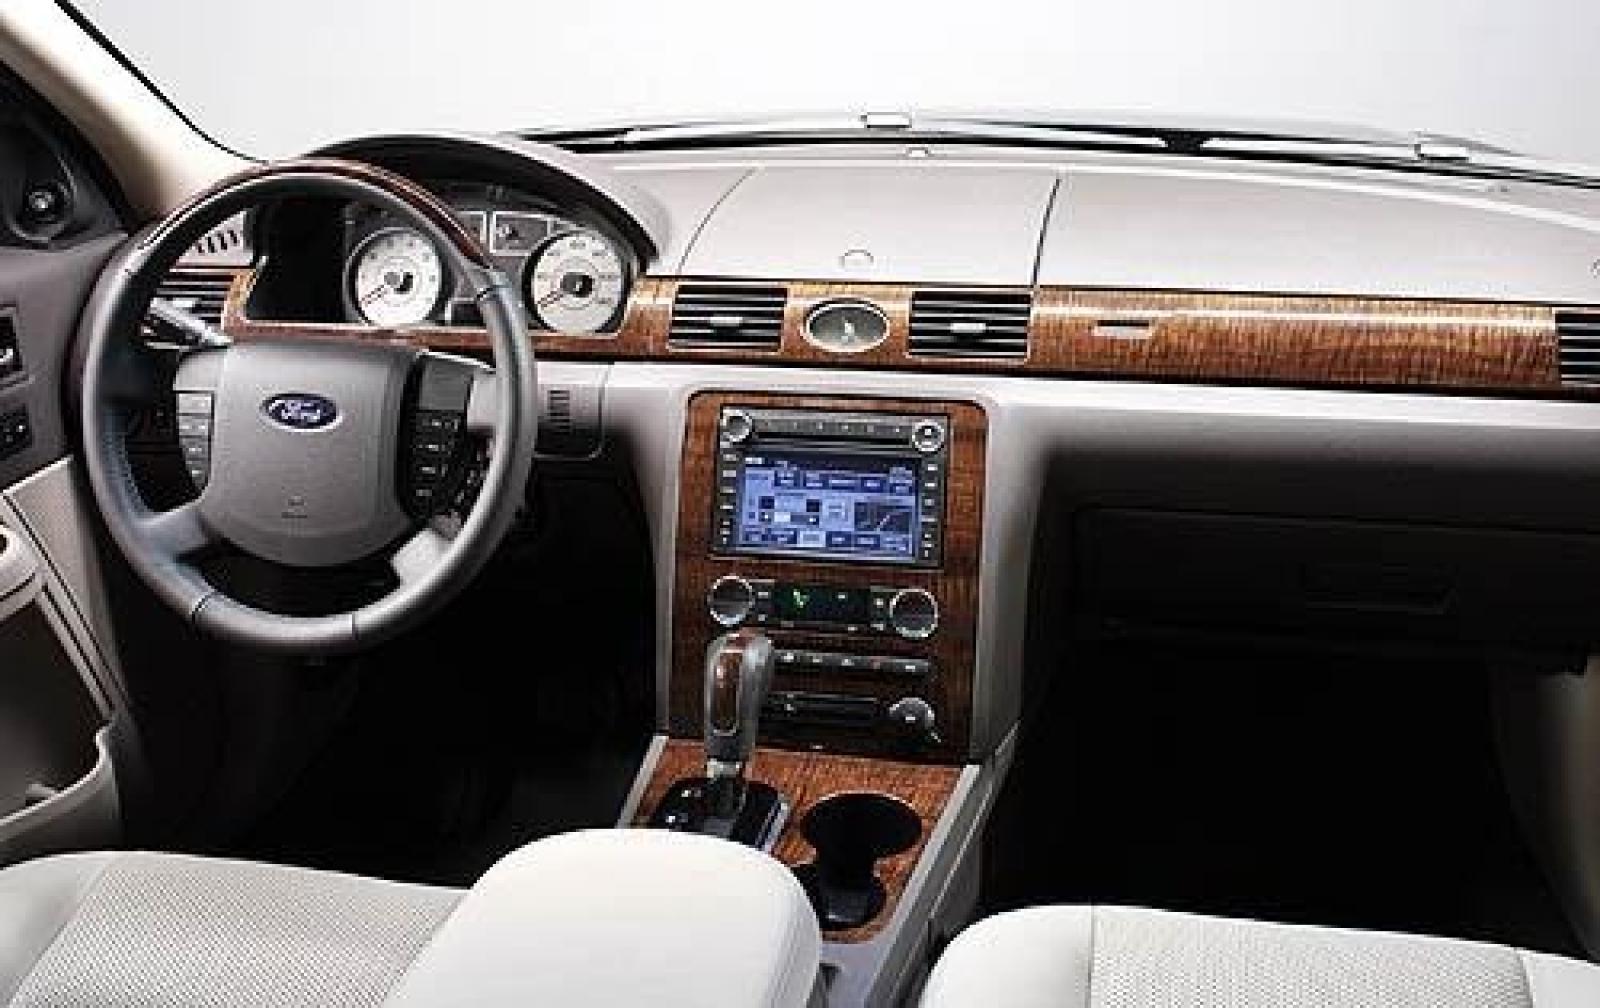 2009 ford taurus 8 2008 ford taurus limited exterior 8 800 1024 1280 1600 origin